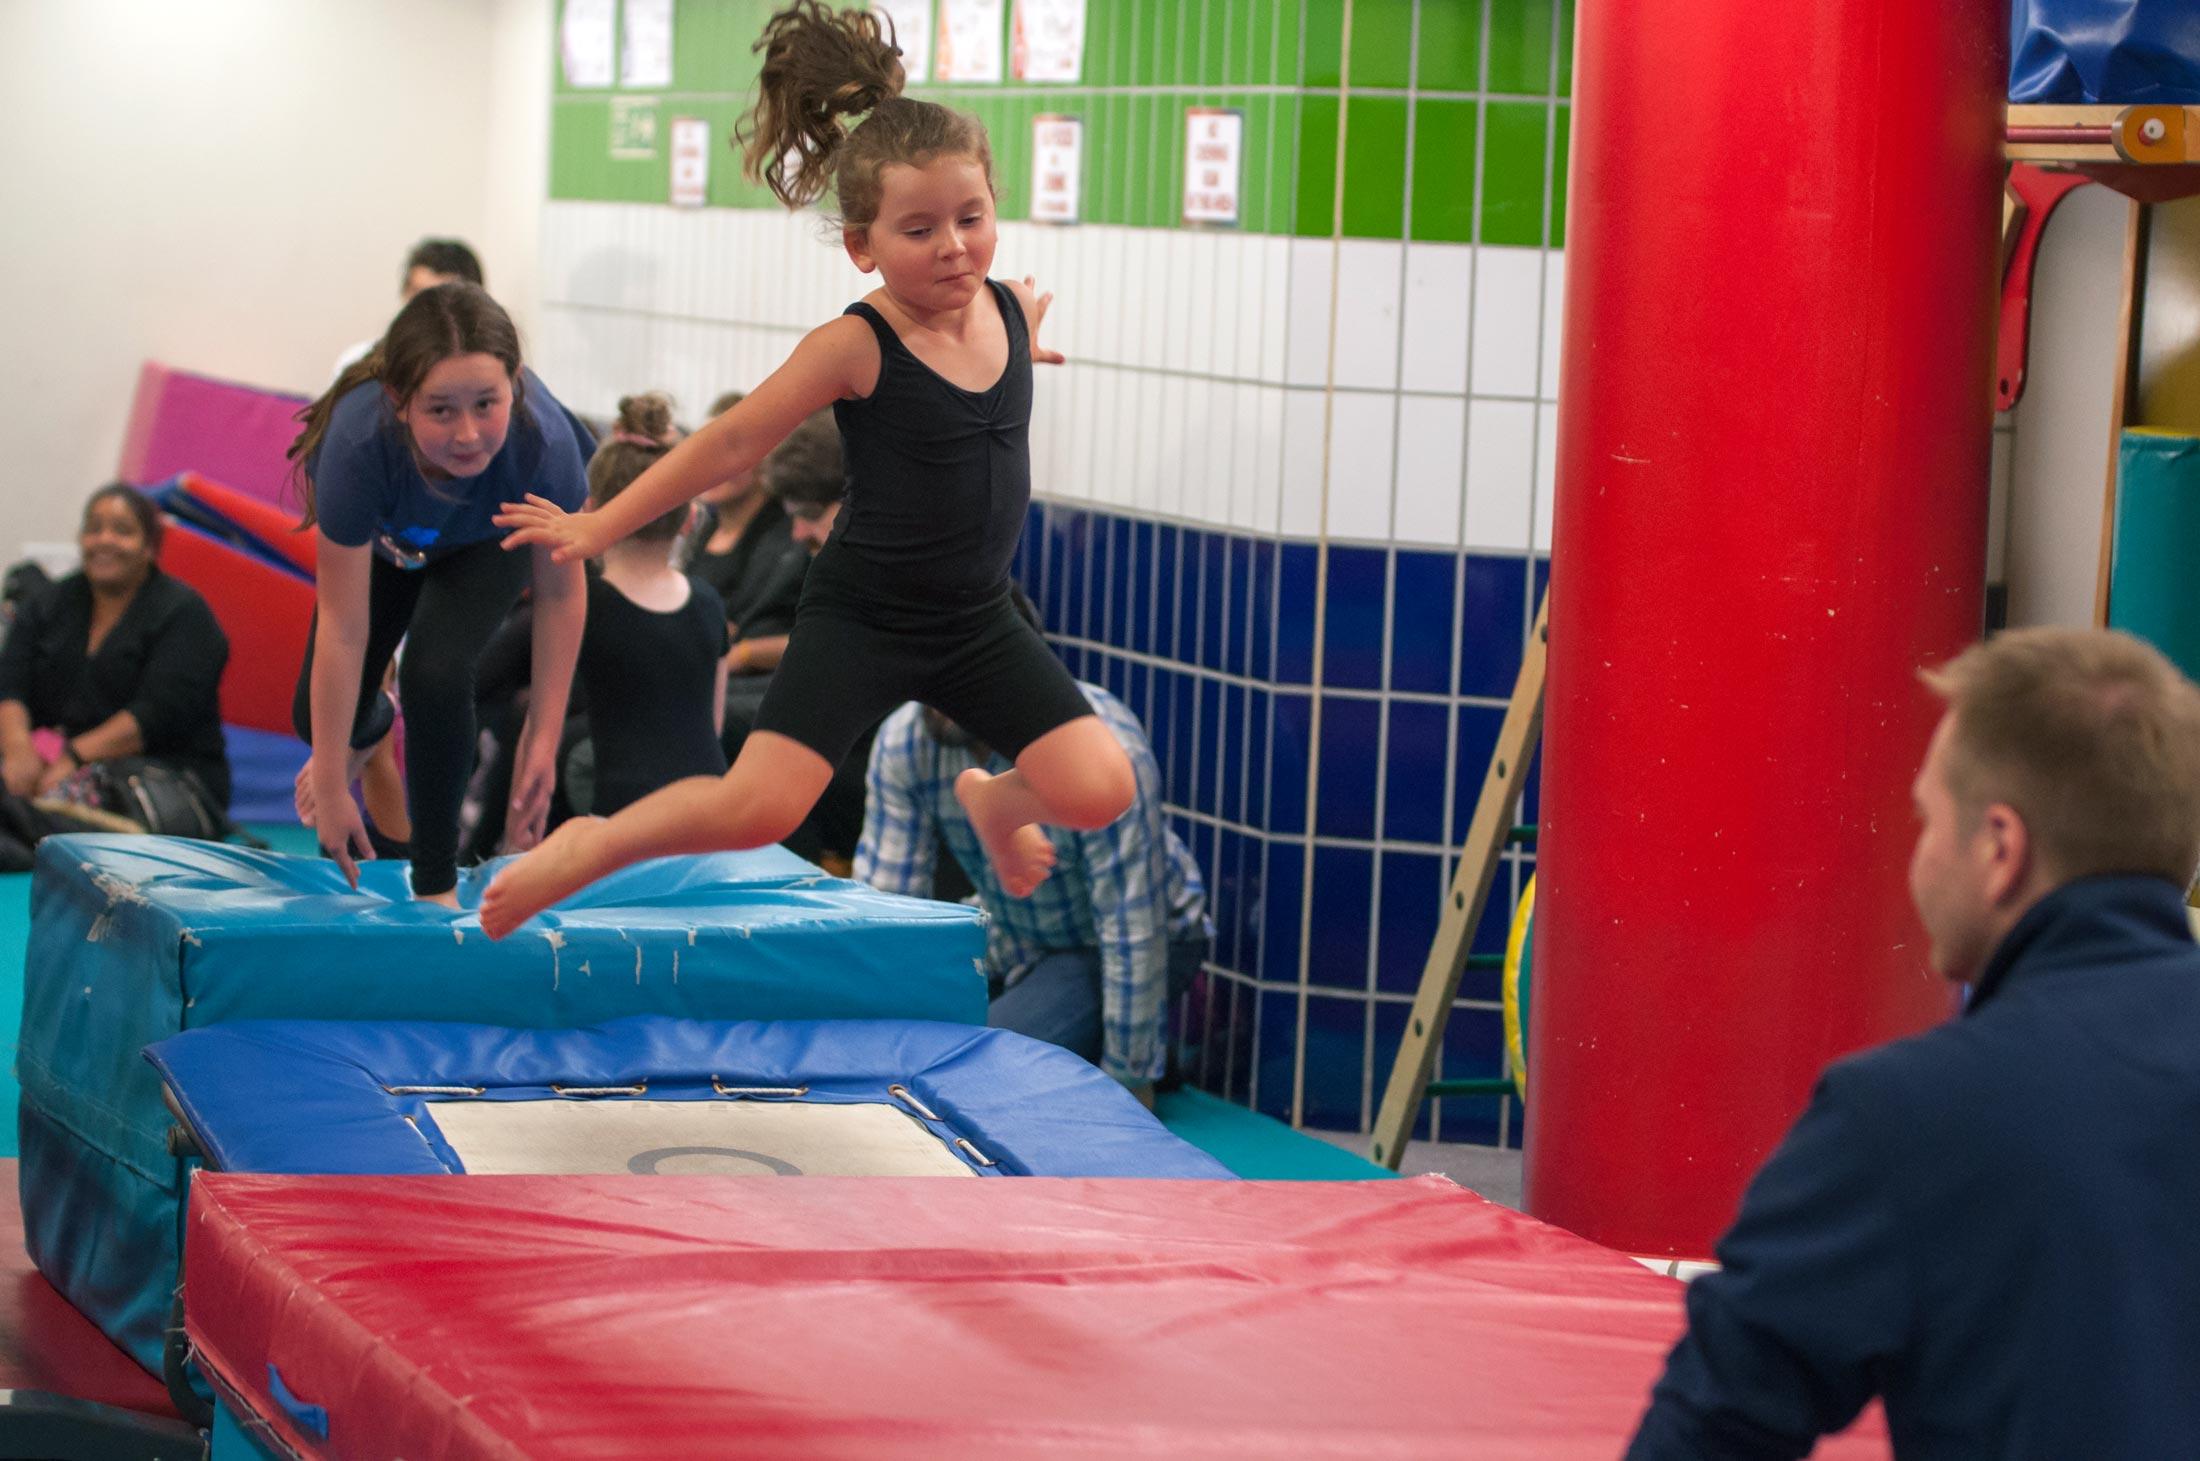 girl jumping off a trampette onto mats